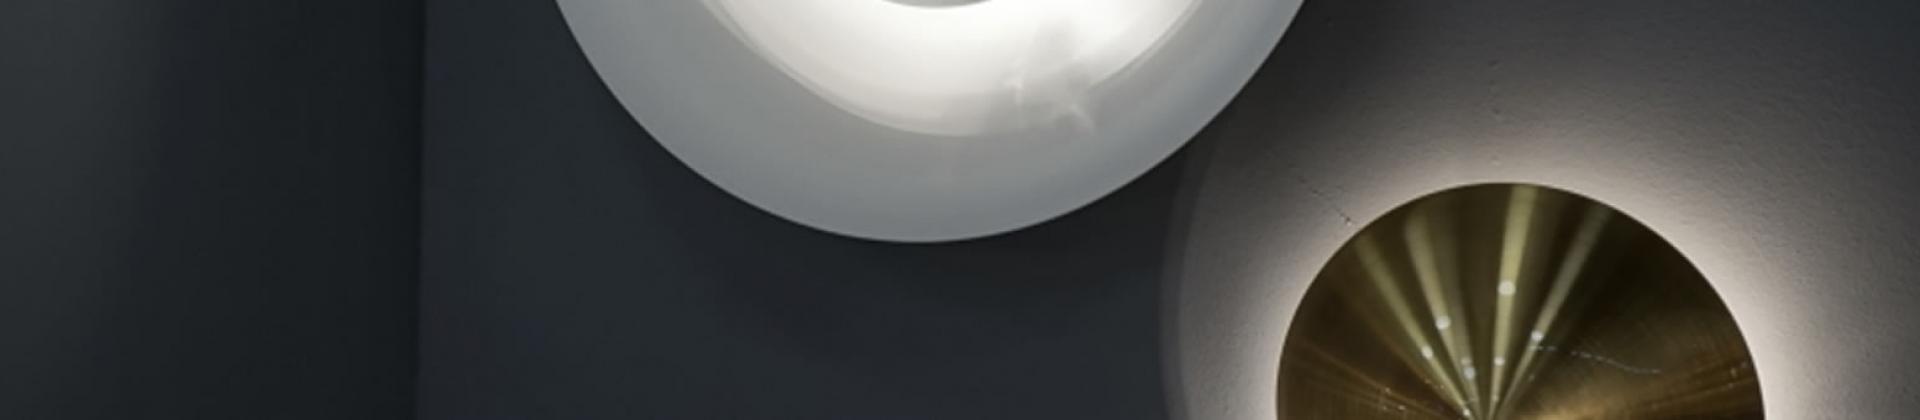 JF Sevilla Aromas - Lámparas de diseño